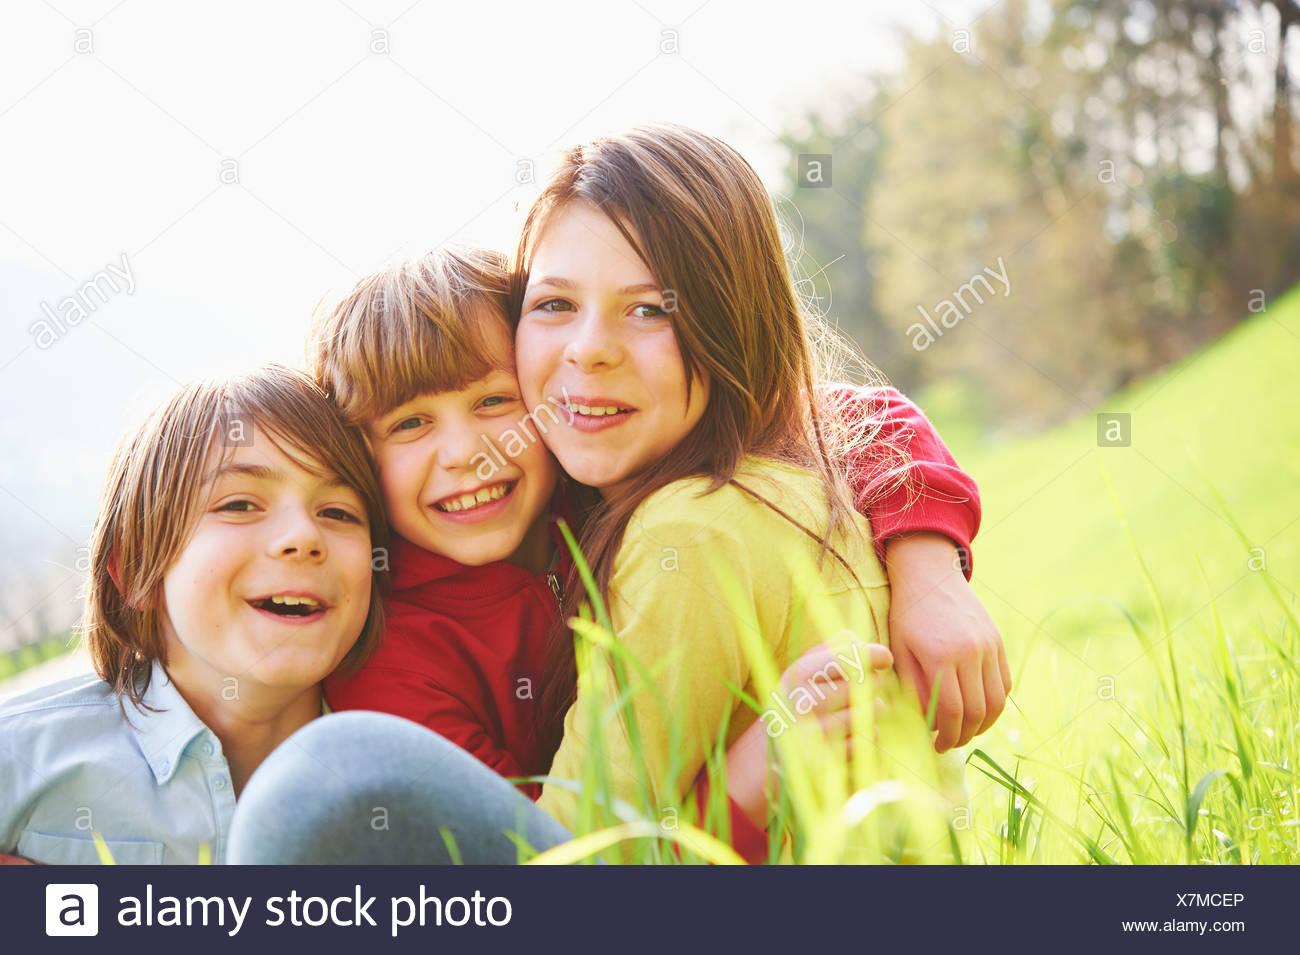 Jeunes Frères et soeur sitting in grassy field Photo Stock